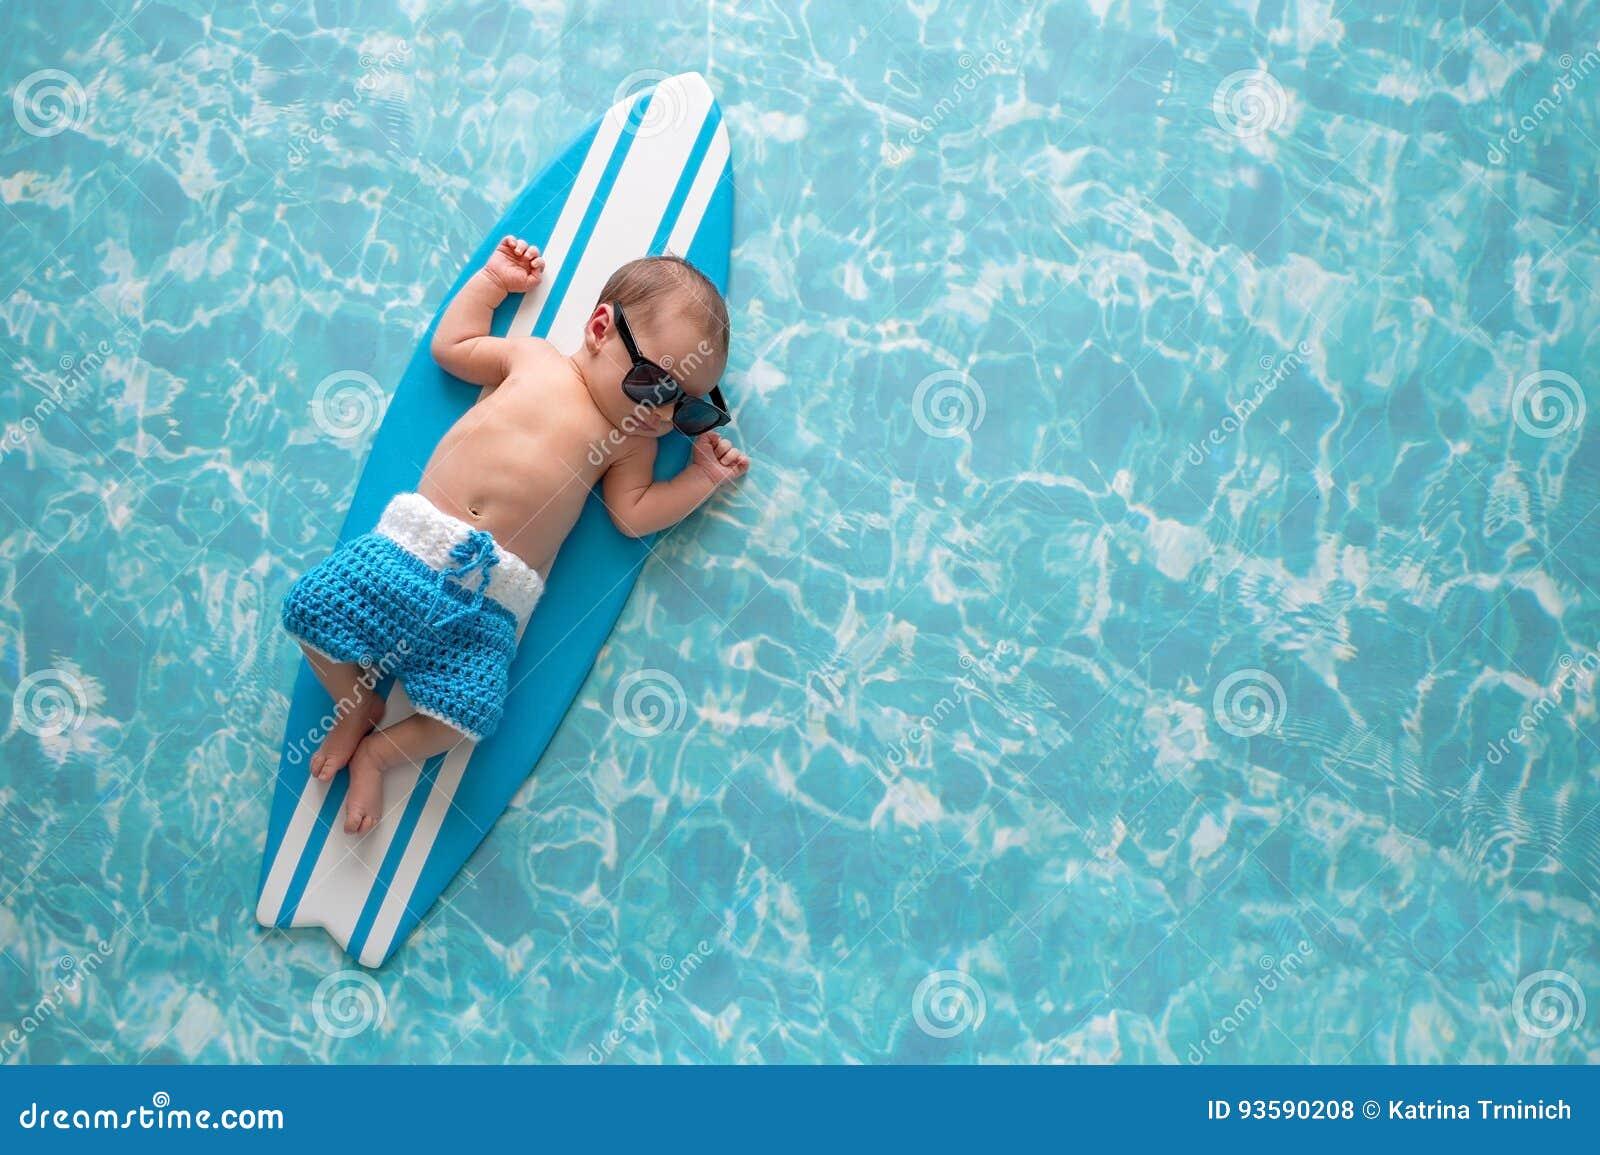 70877f72d Newborn Baby Boy On Surfboard Stock Photo - Image of bathing